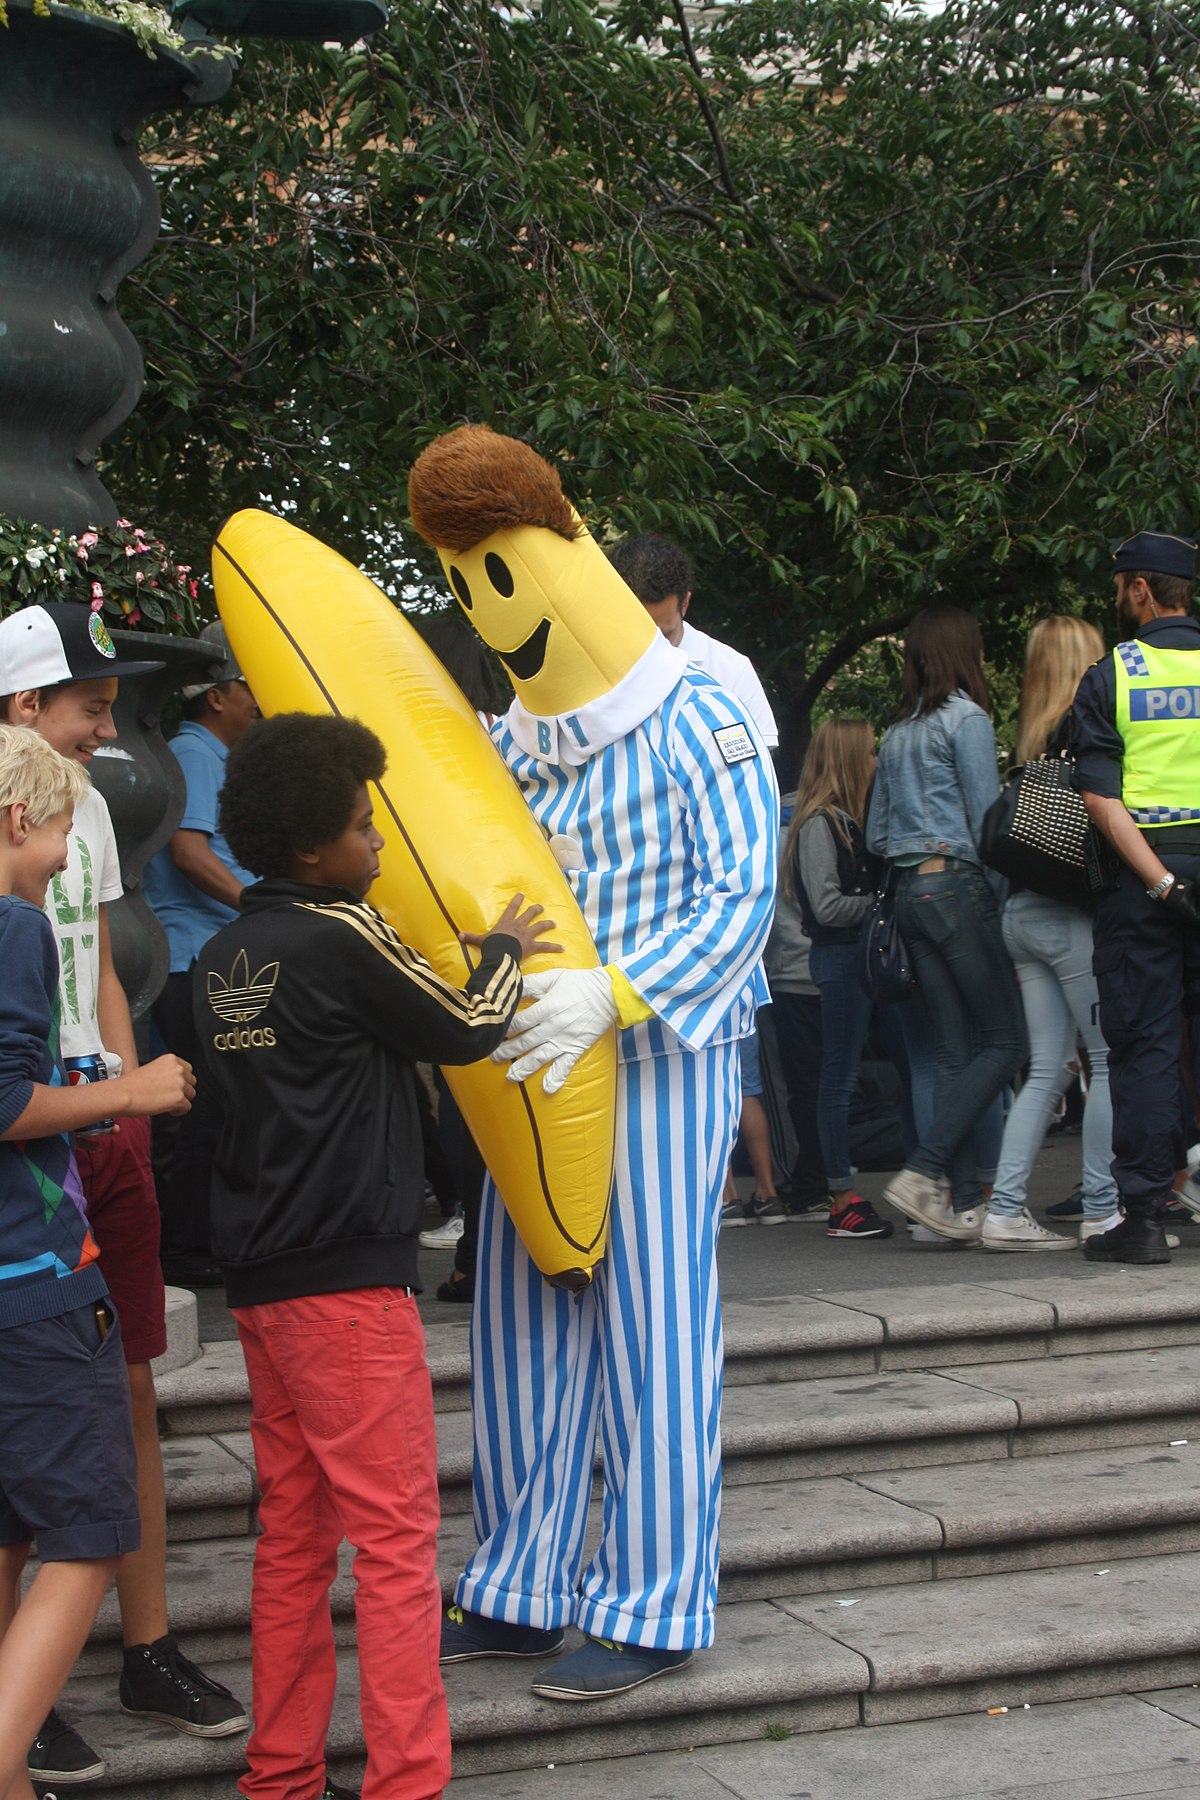 Libre Enciclopedia WikipediaLa Pijamas Bananas En QdWxCorBe